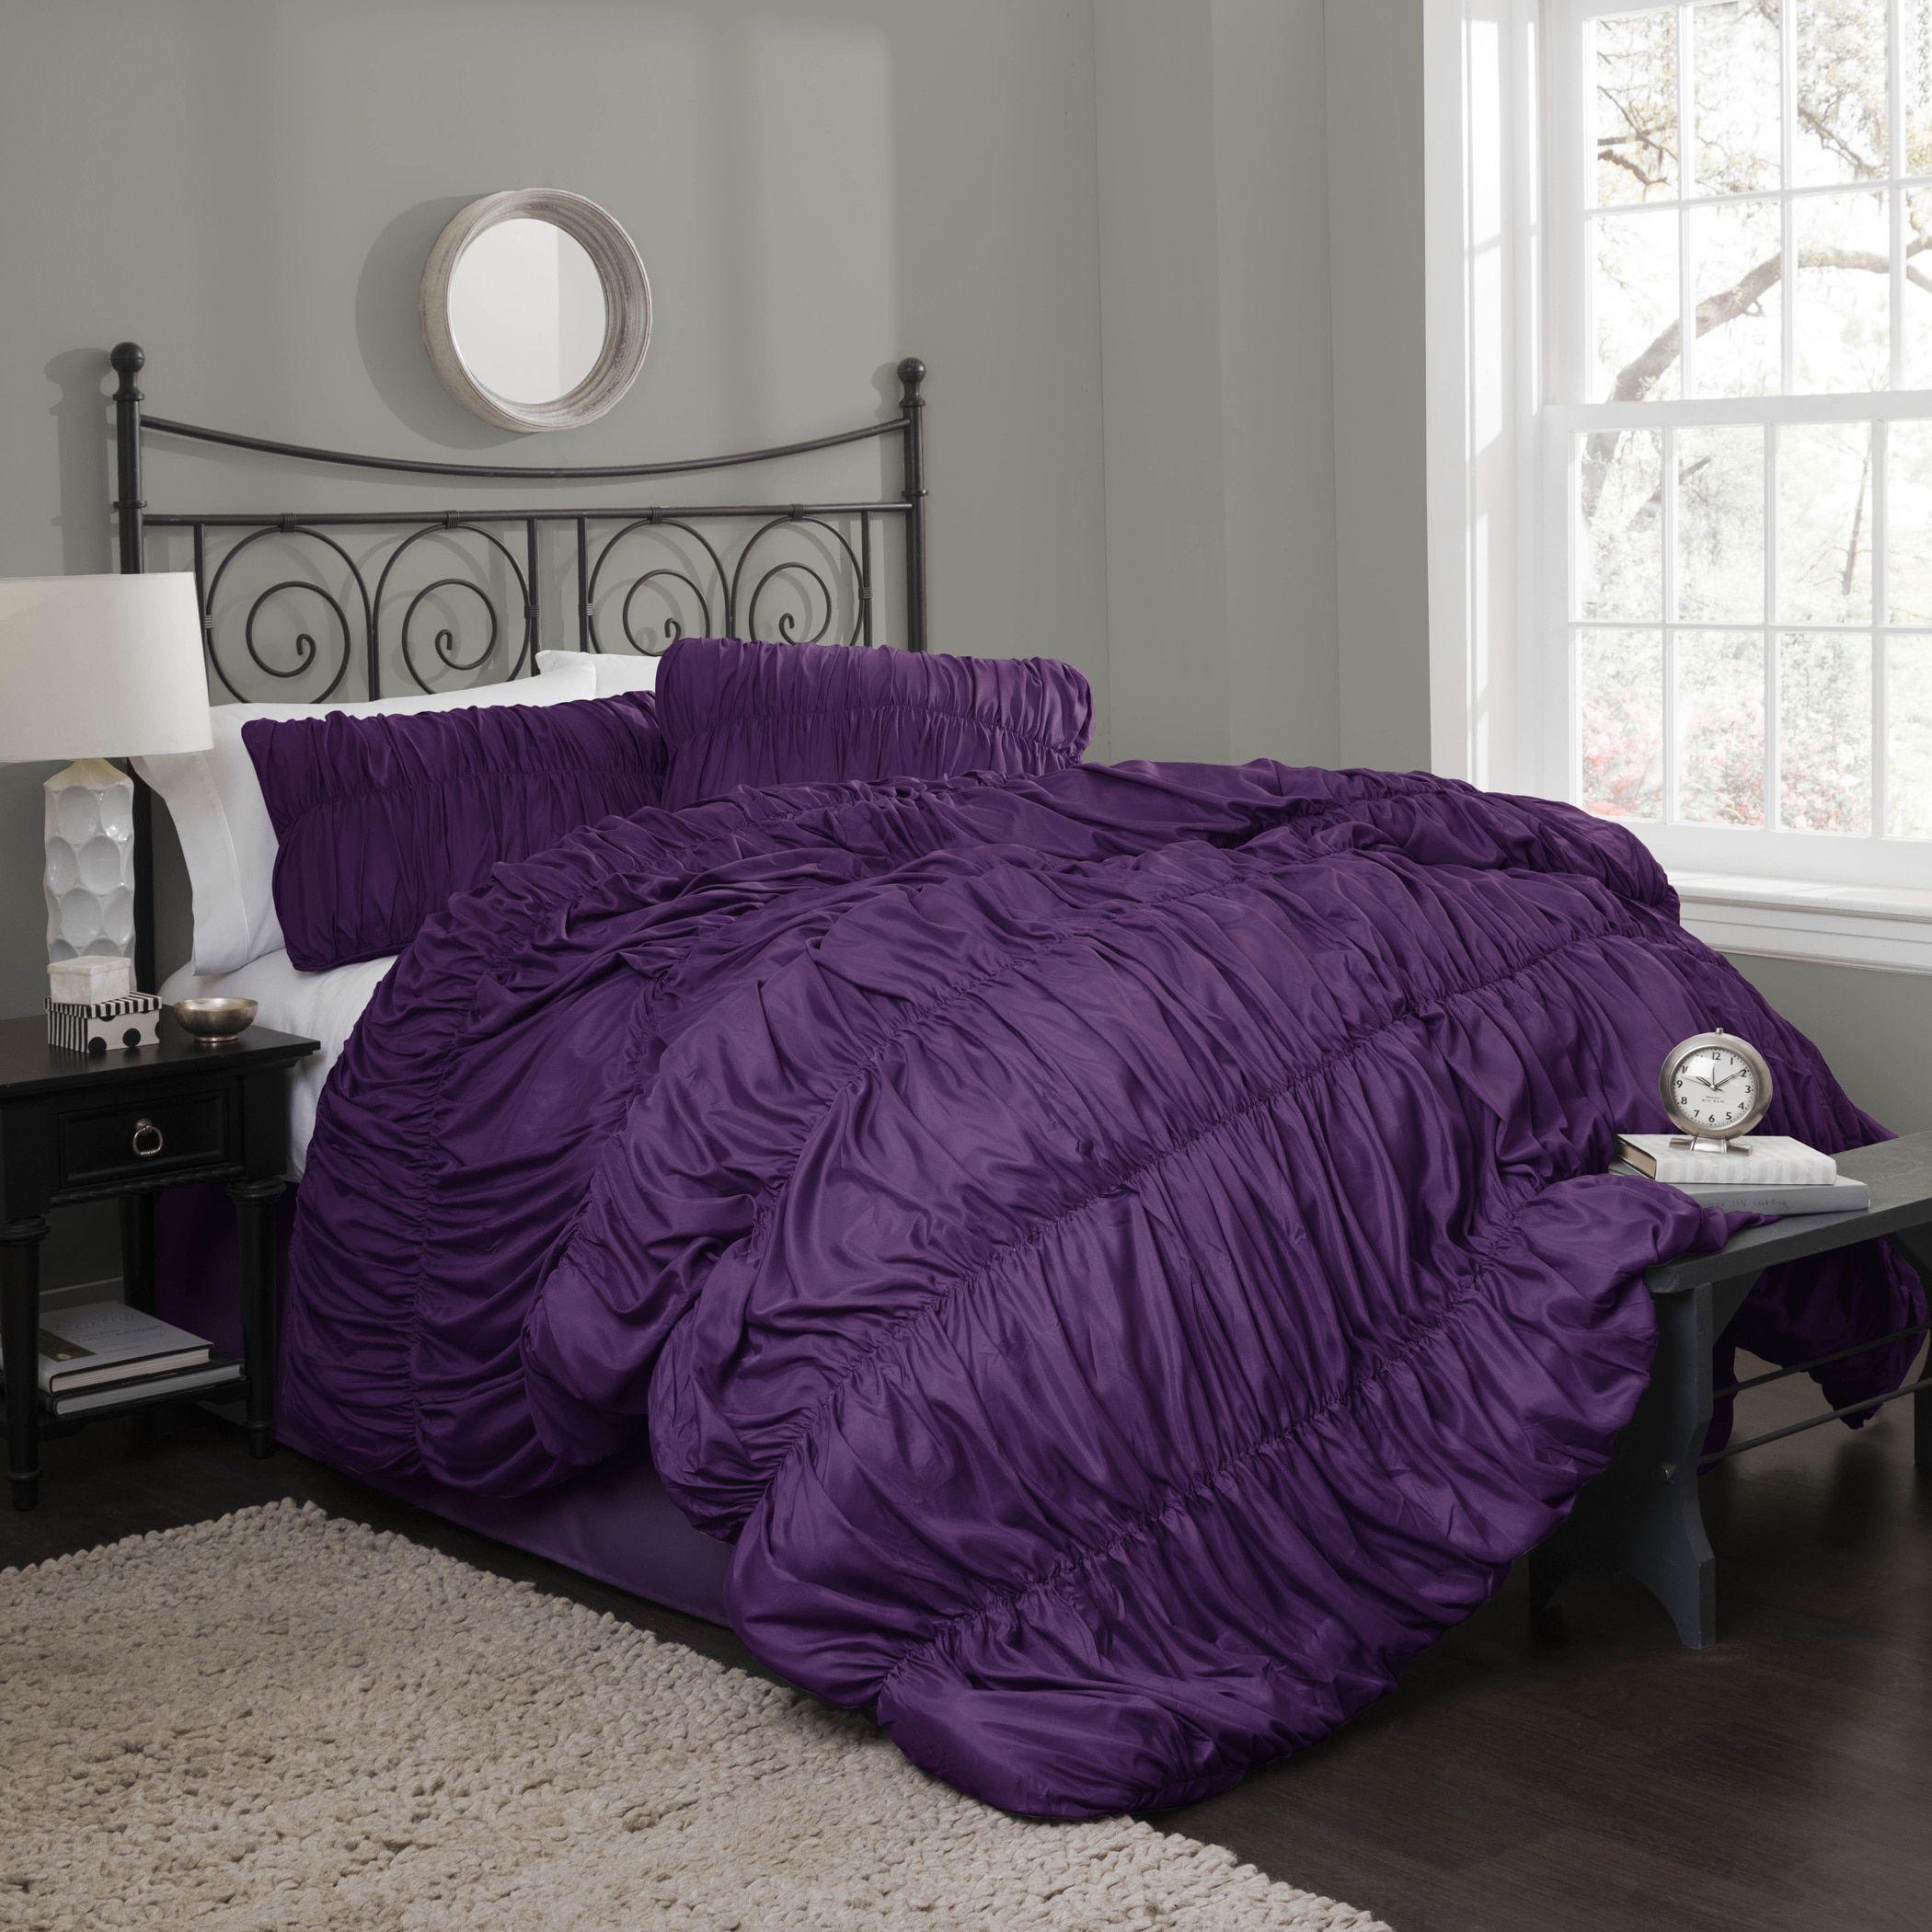 Lush Decor Venetian 4 Piece Comforter Set